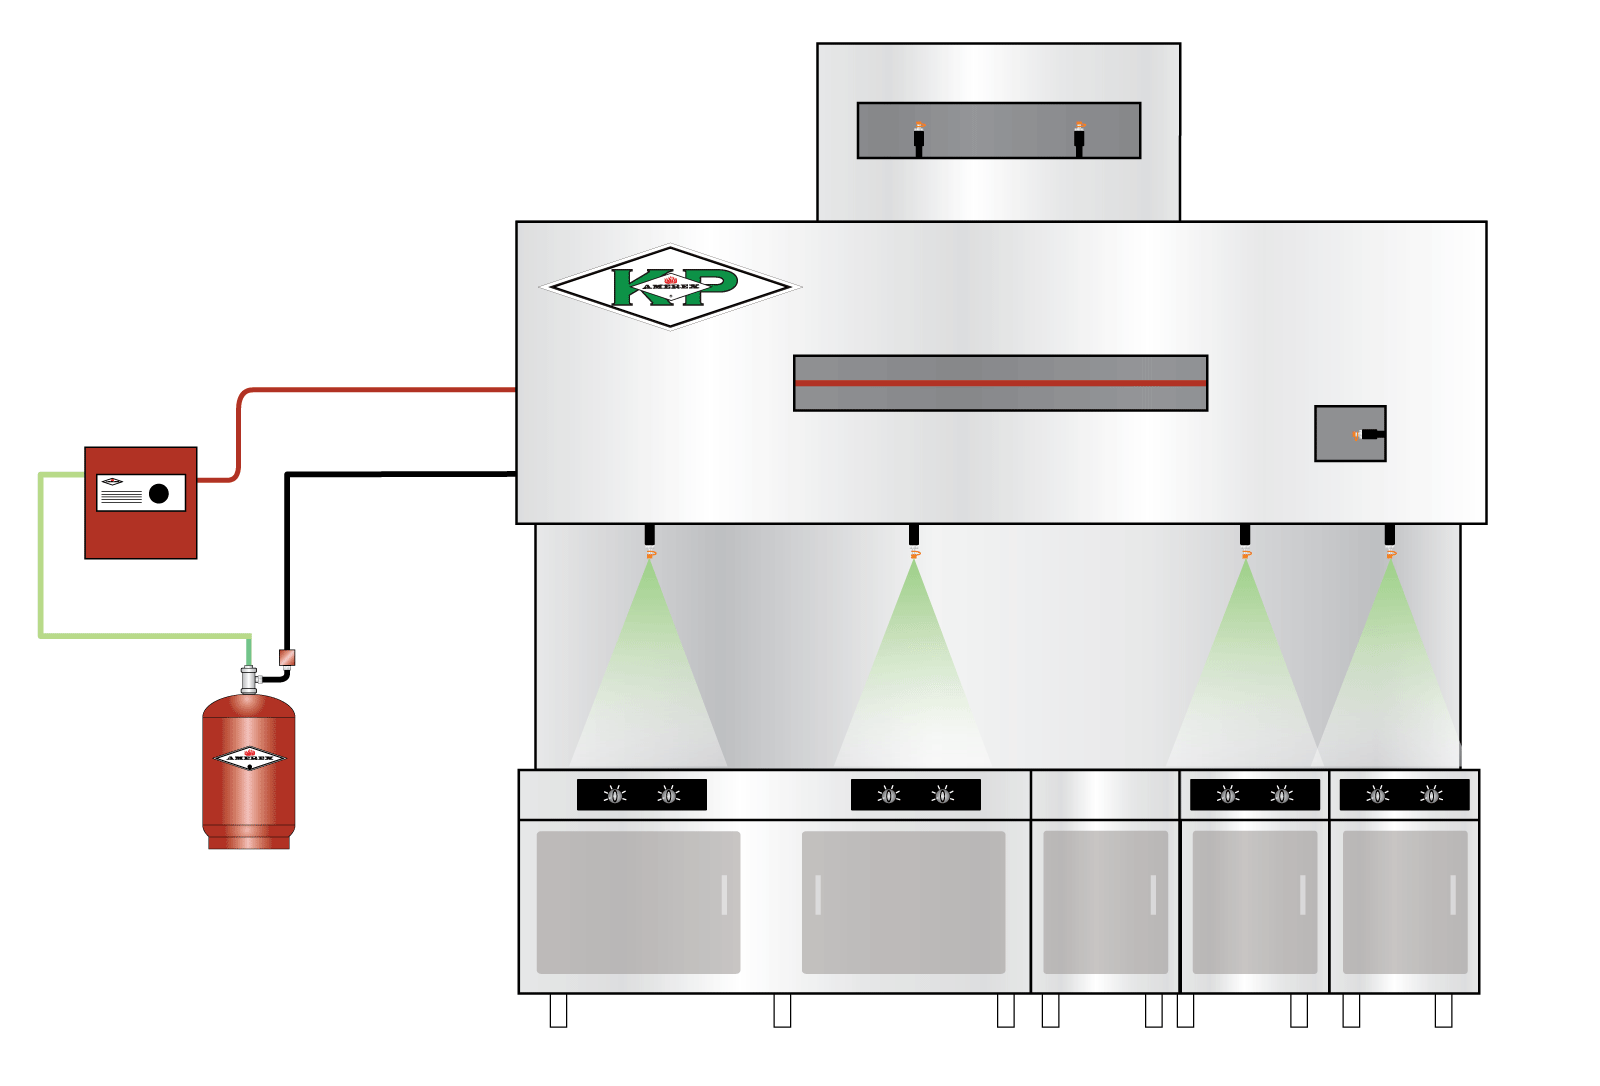 amerex kp module blockout